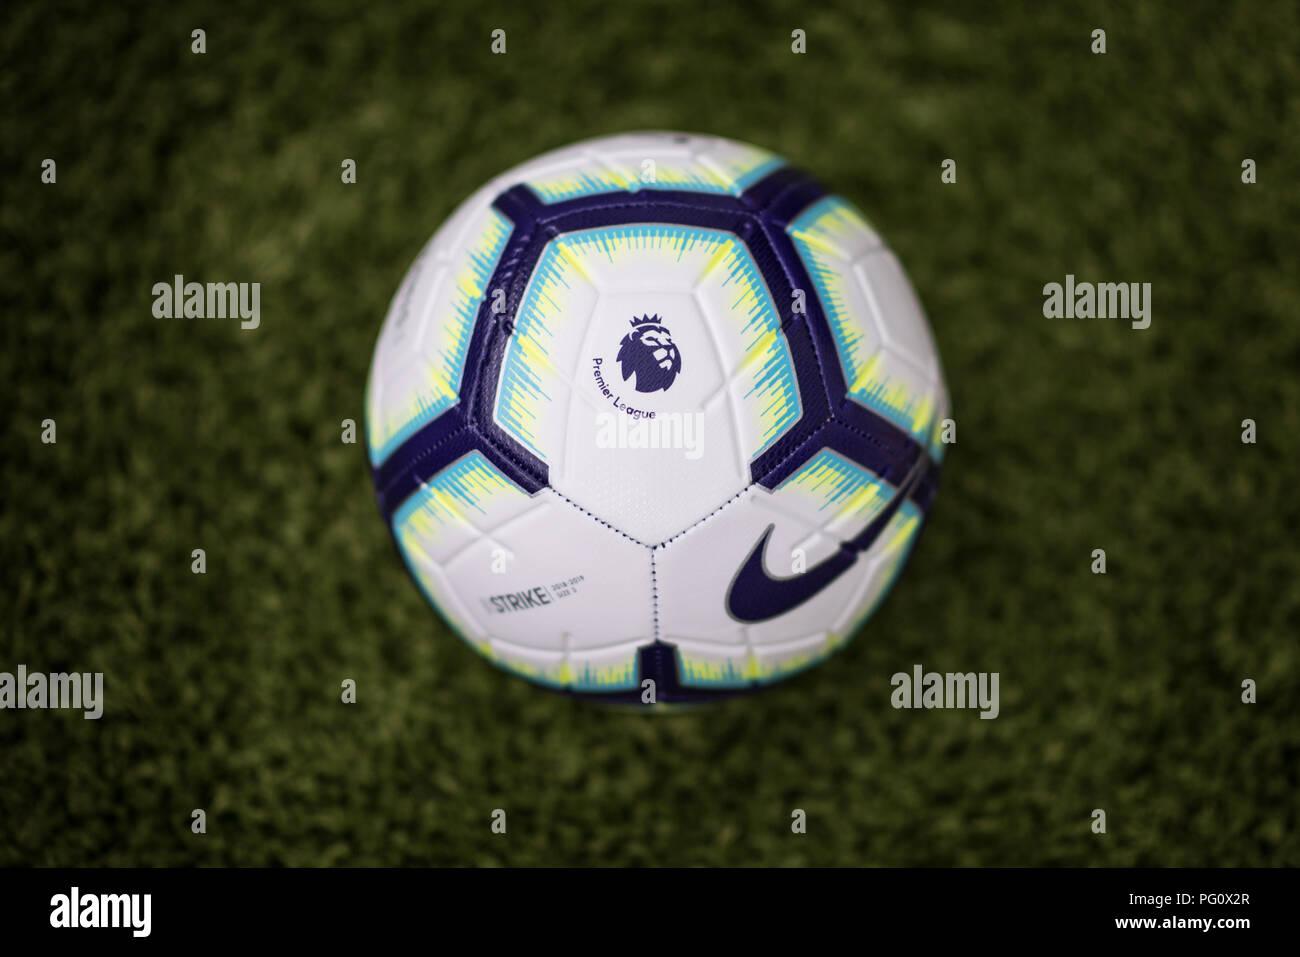 349bcc37a Merlin Nike pelota para la temporada 2018/19 de la Premier League ...